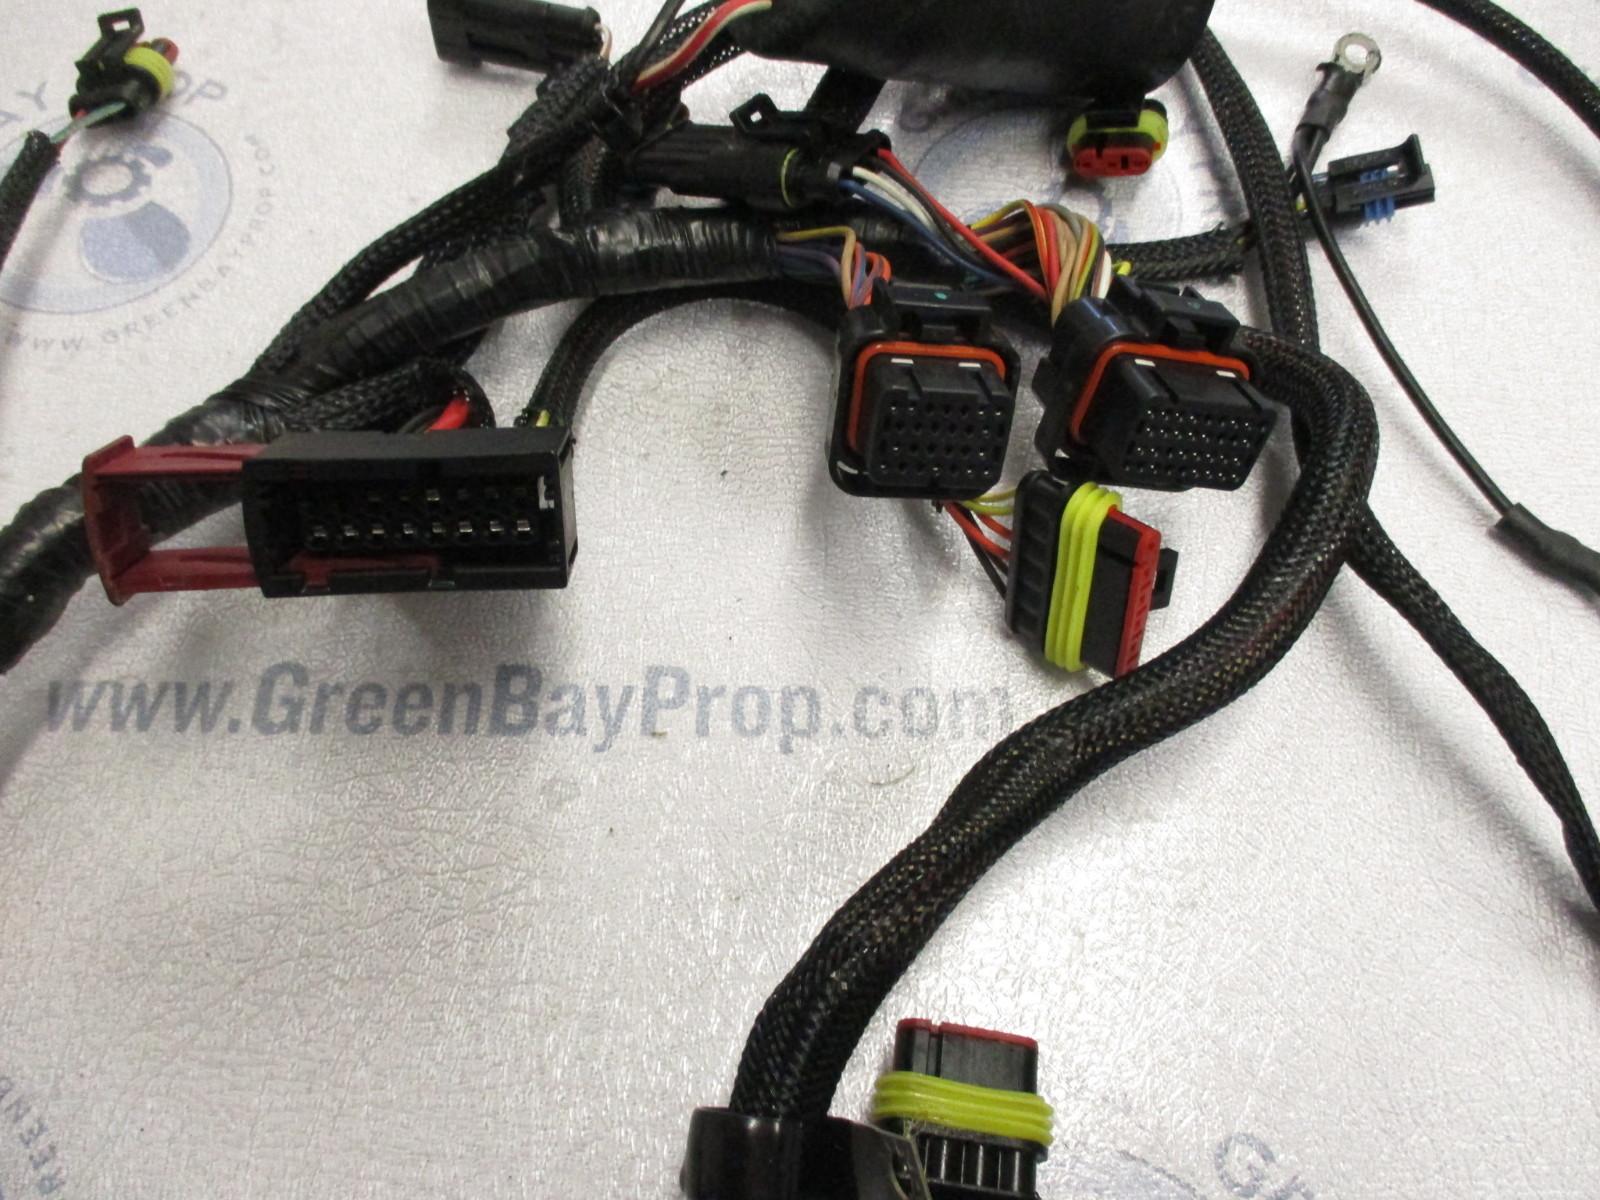 0586973 evinrude etec outboard engine motor wire harness. Black Bedroom Furniture Sets. Home Design Ideas